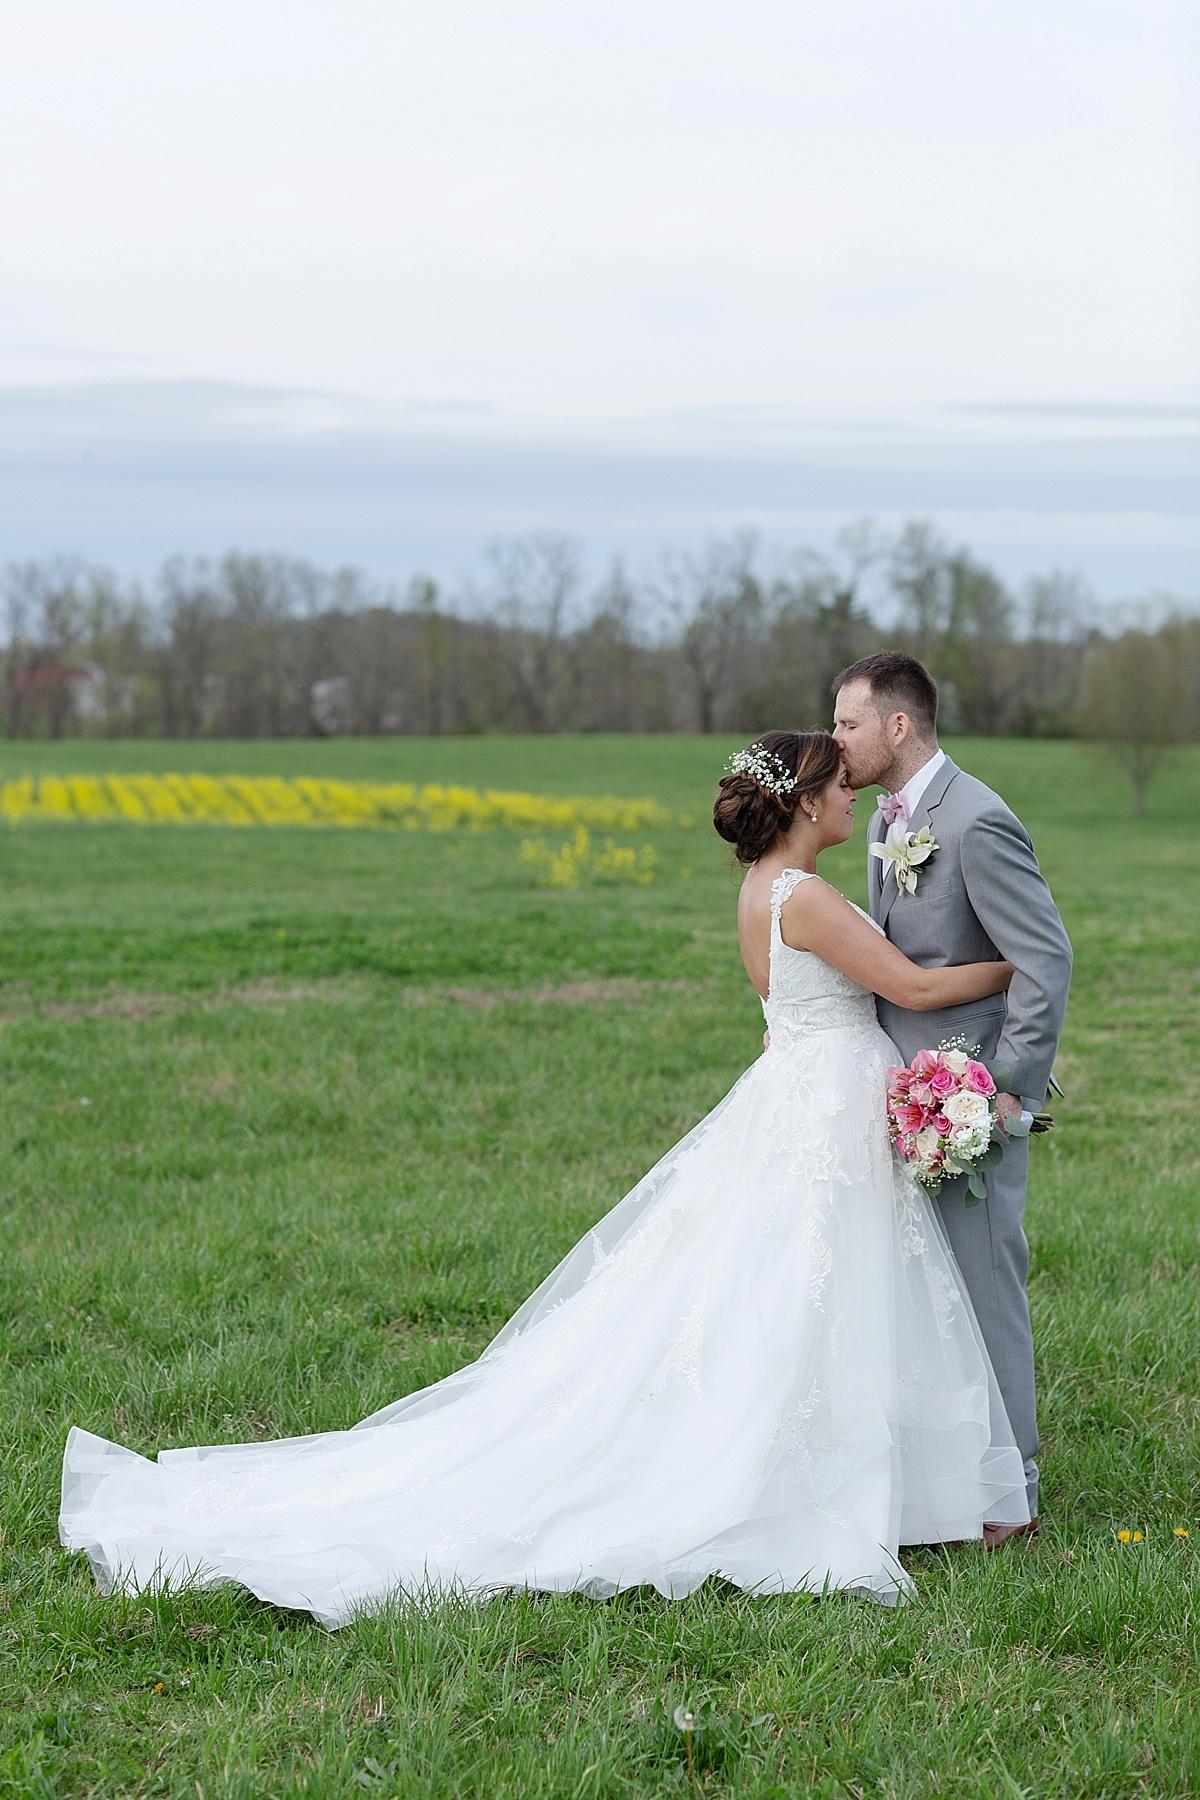 henry-county-wedding-kentucky-farm-spring-wedding-88.JPG